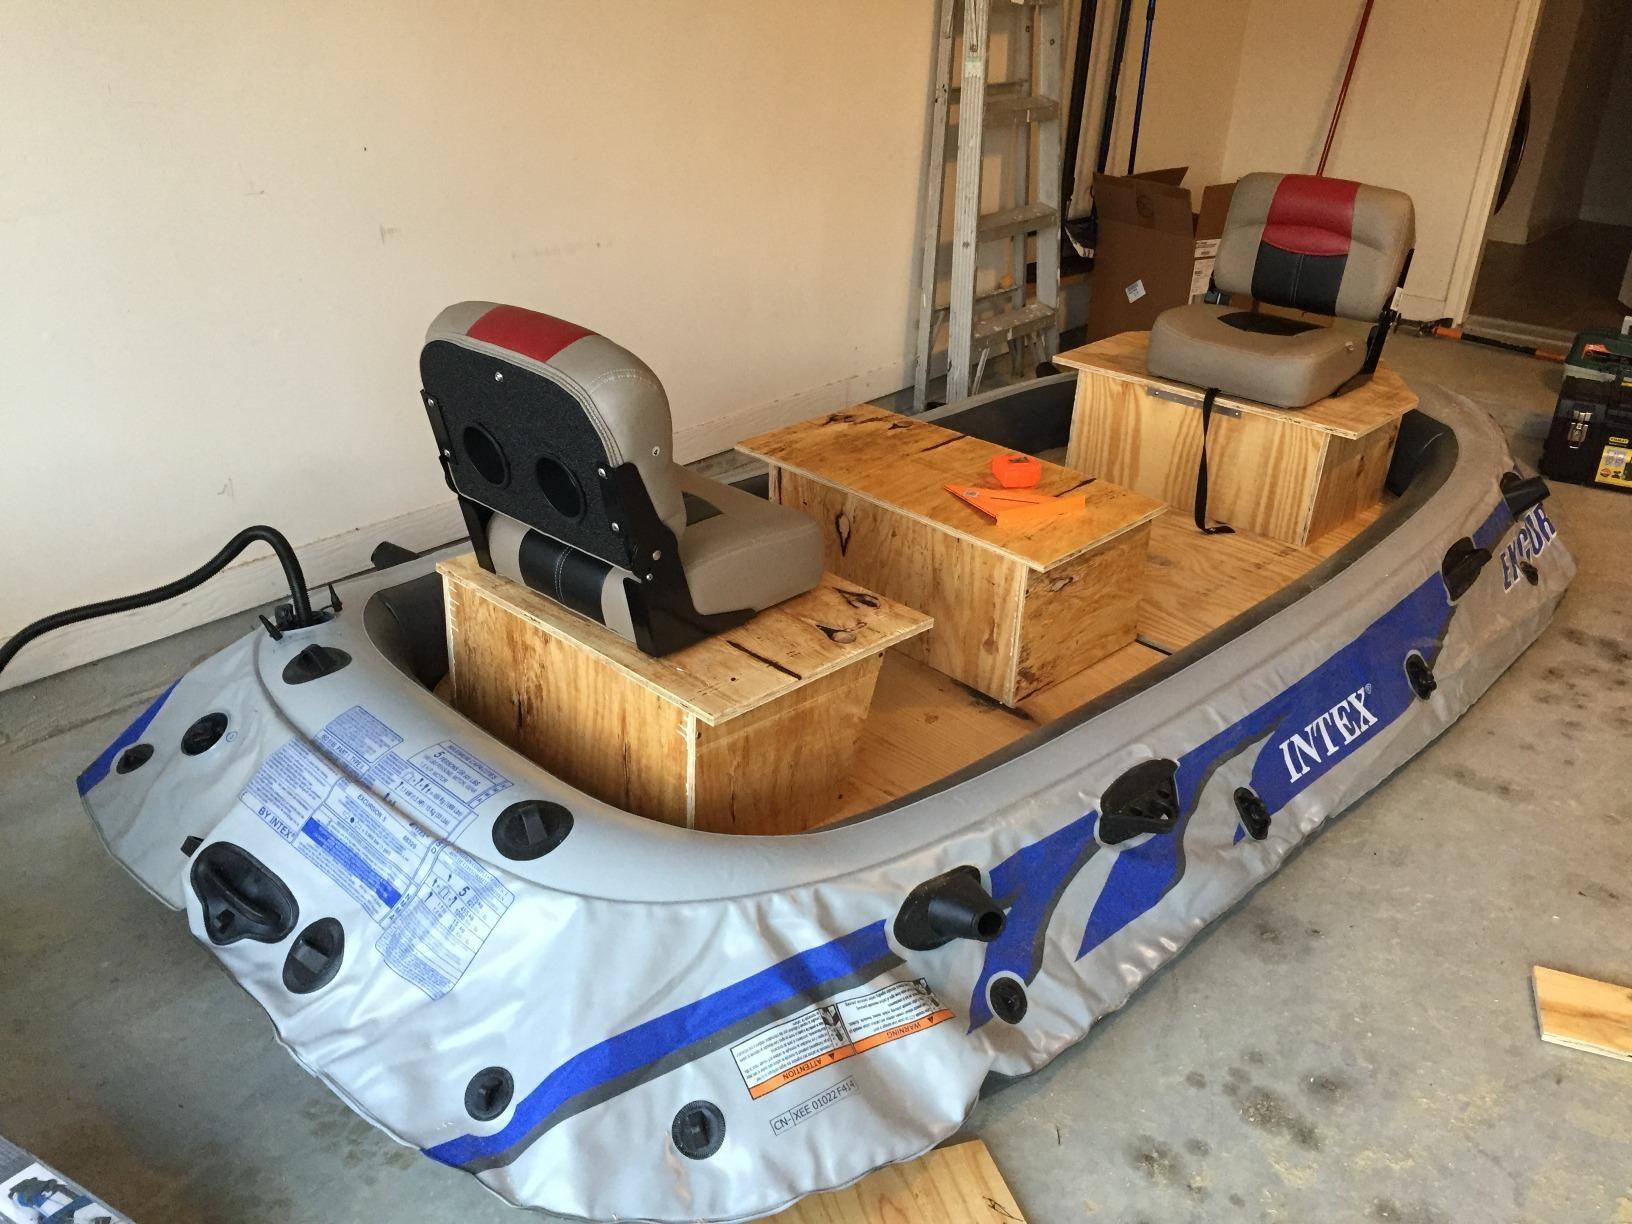 Amazon.com  Intex Excursion 5 5-Person Inflatable Boat Set with Aluminum & Amazon.com : Intex Excursion 5 5-Person Inflatable Boat Set with ...